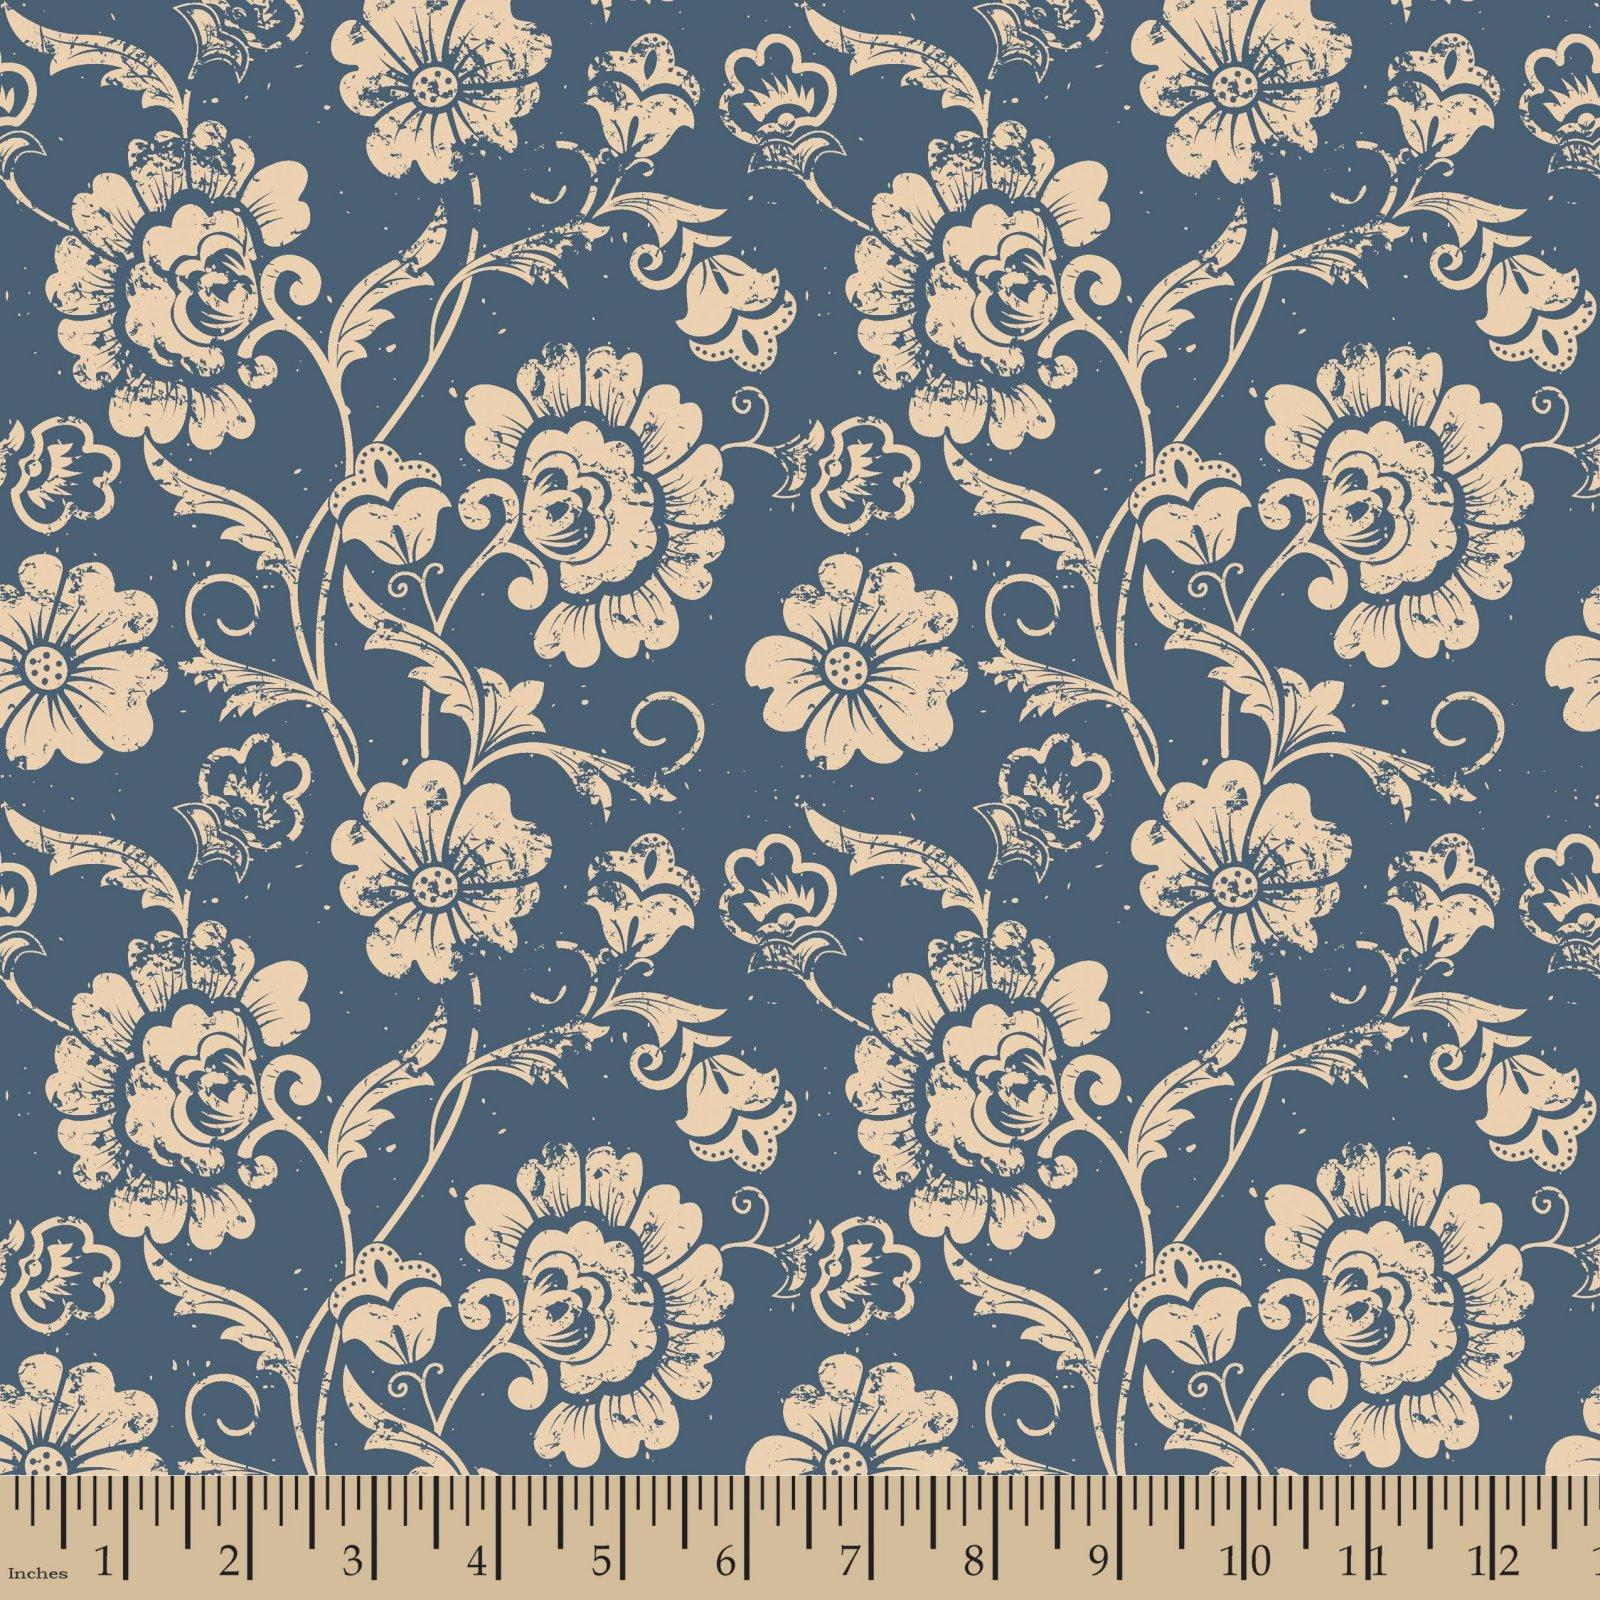 Aged Floral Blue